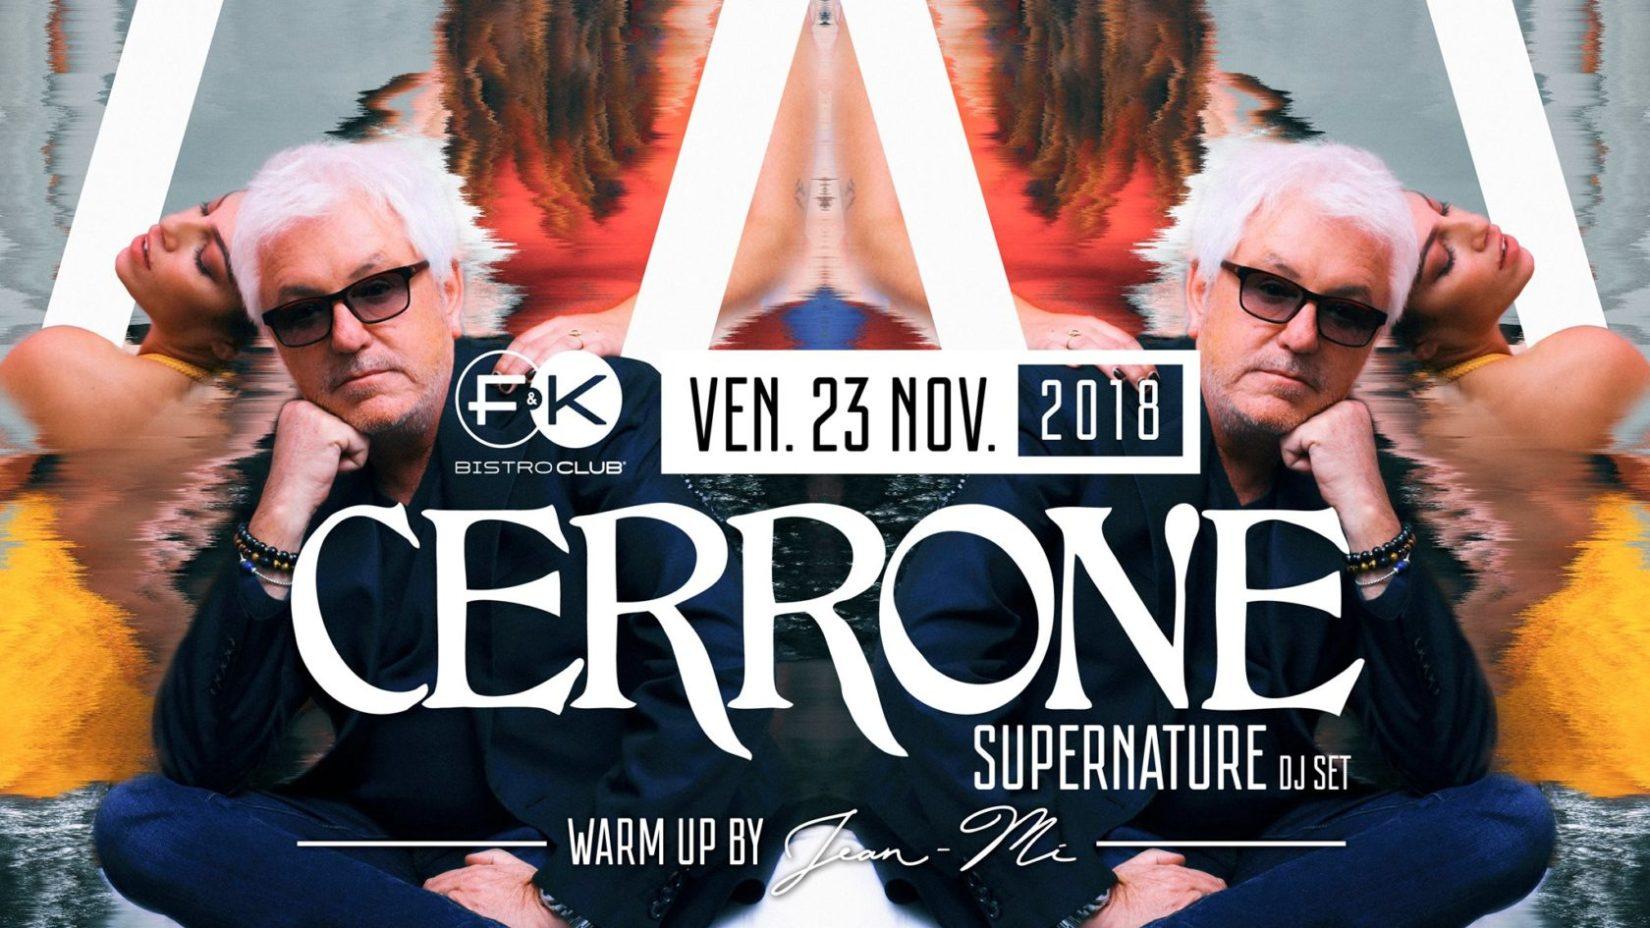 Cerrone F&K